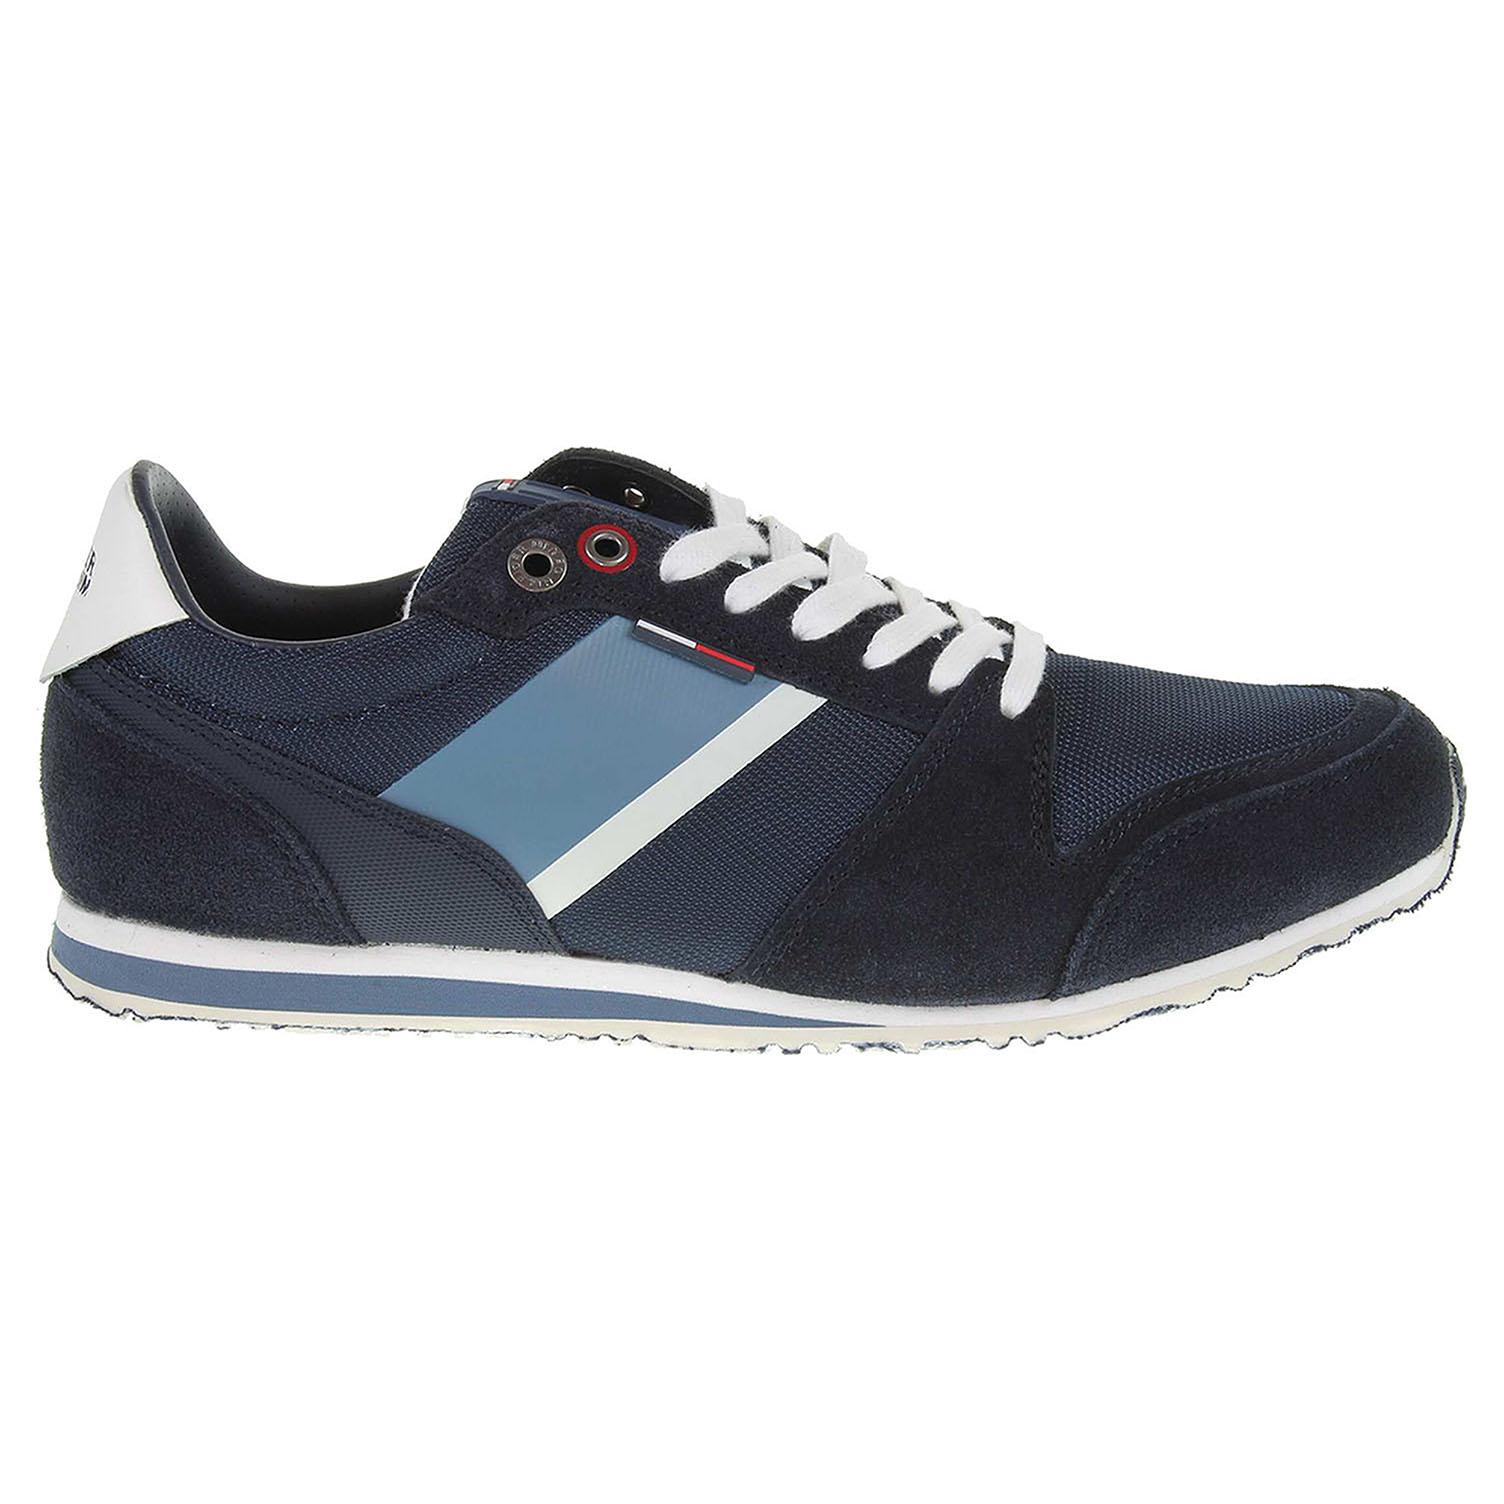 Ecco Tommy Hilfiger pánská obuv FM0FM00327 S2385PRINT 2C1 modrá 24000443